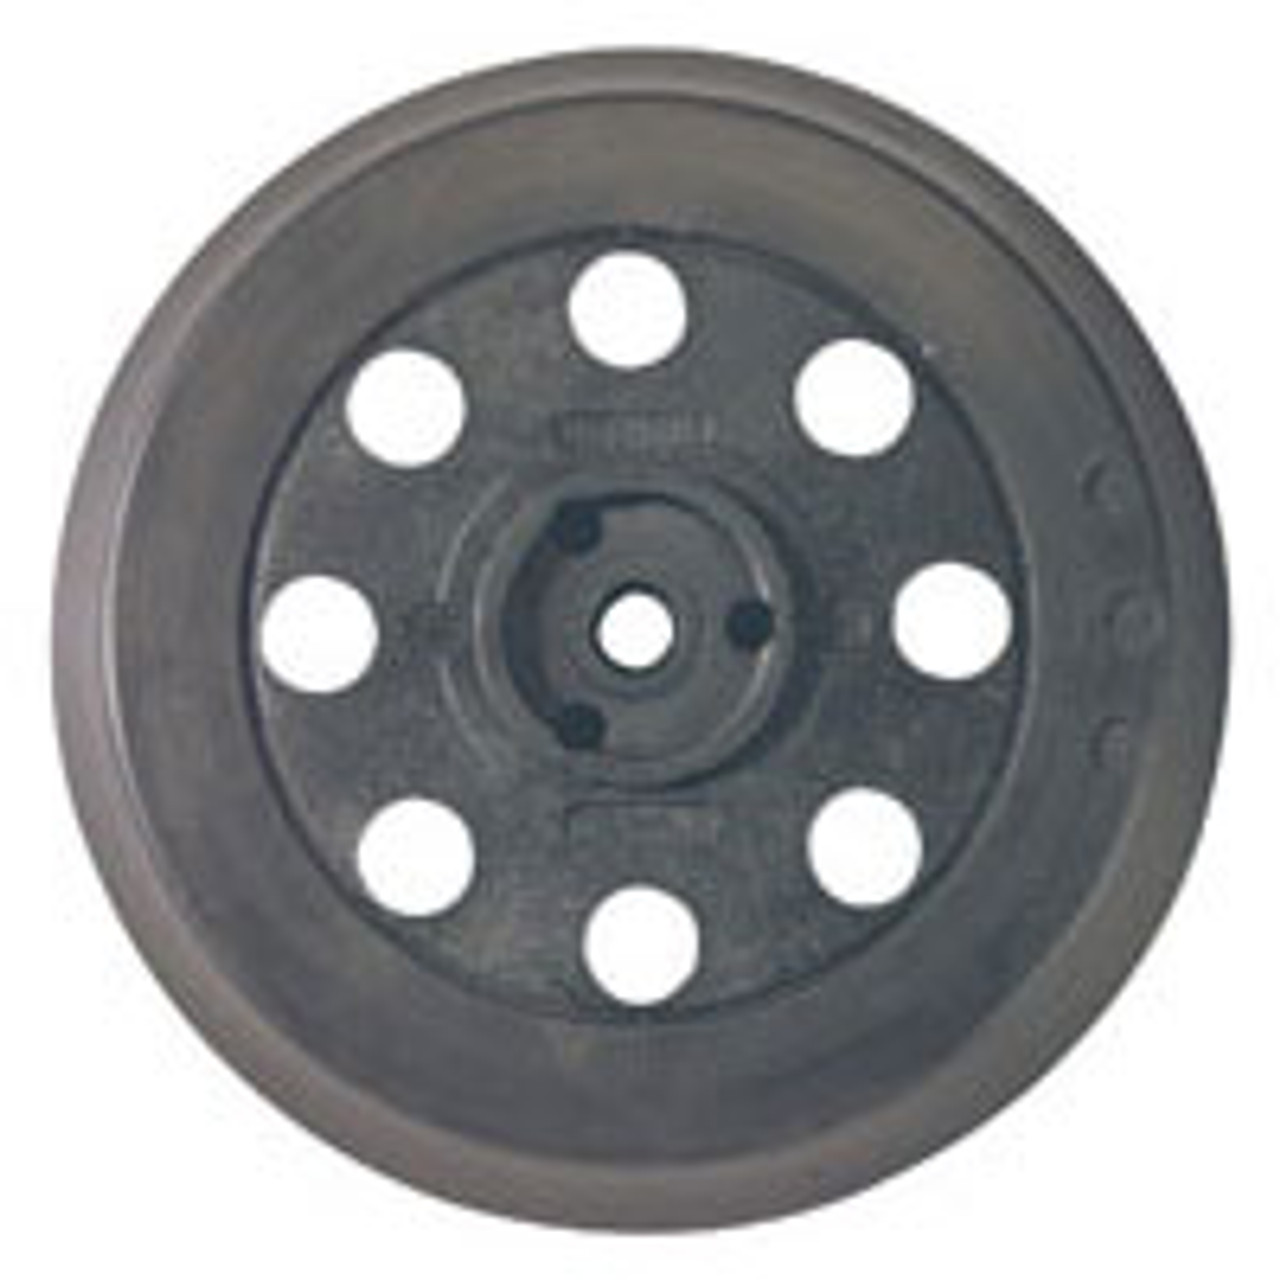 "Bosch 5""x 8 Hole, Med/Soft Sander Backing Pad, Hook & Loop"